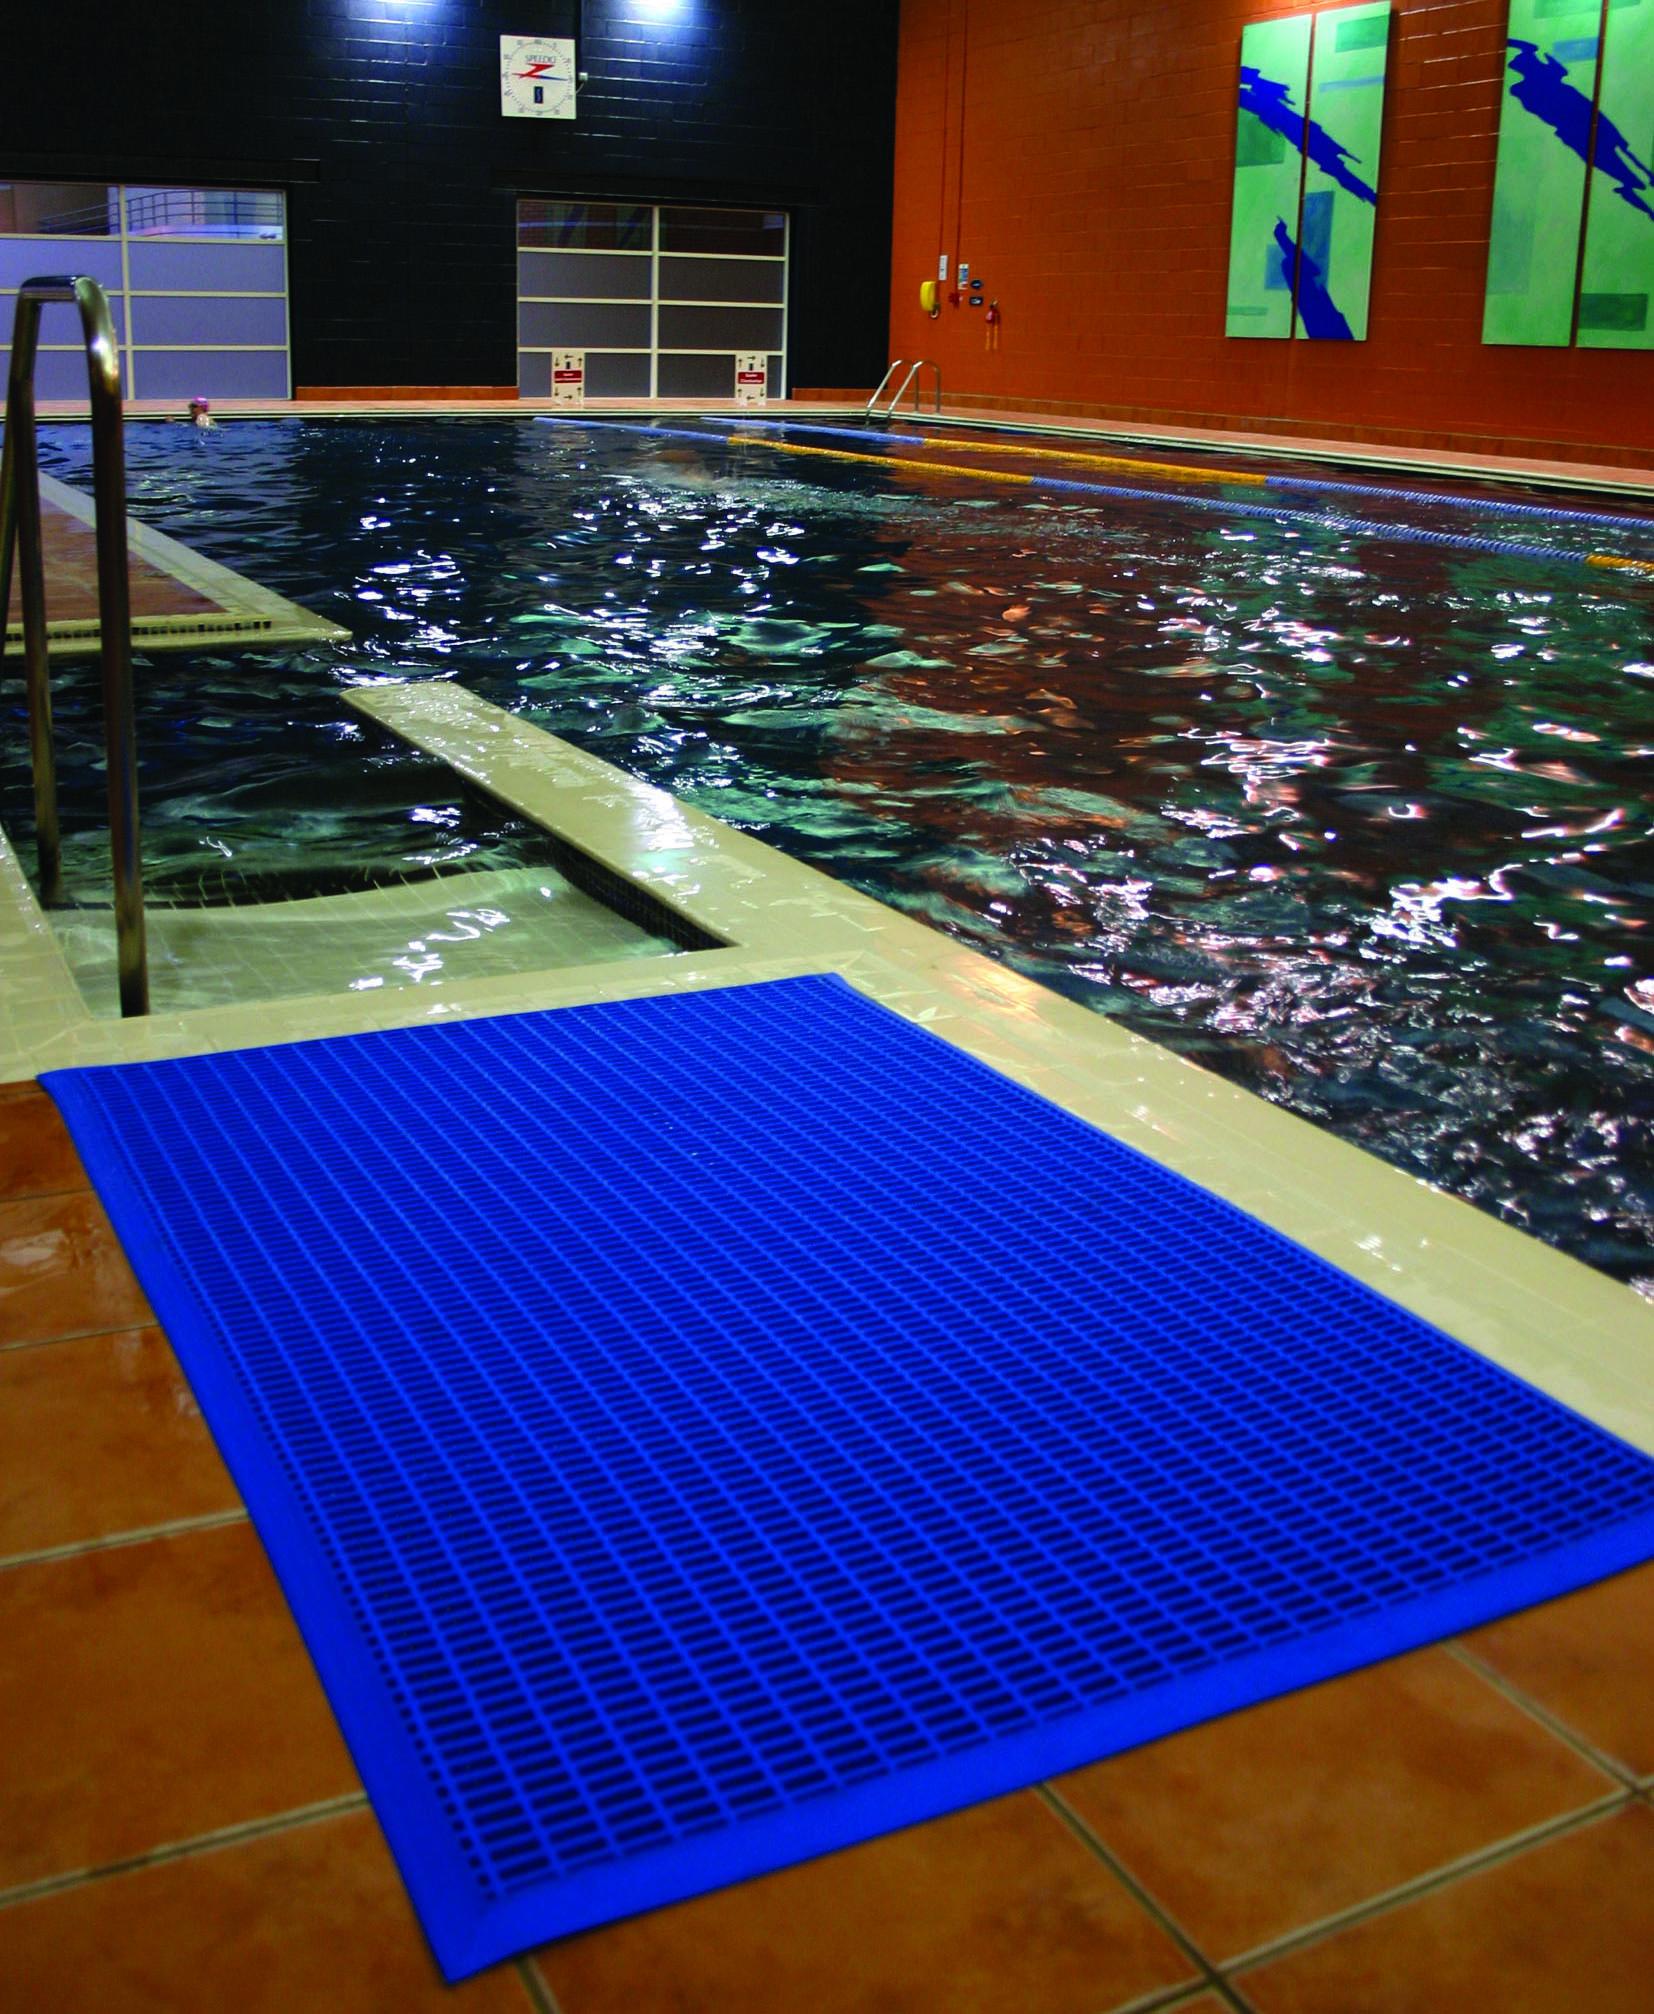 pool mat swimming safety pvc matting wet floor gym drainage non slip 4 colours ebay